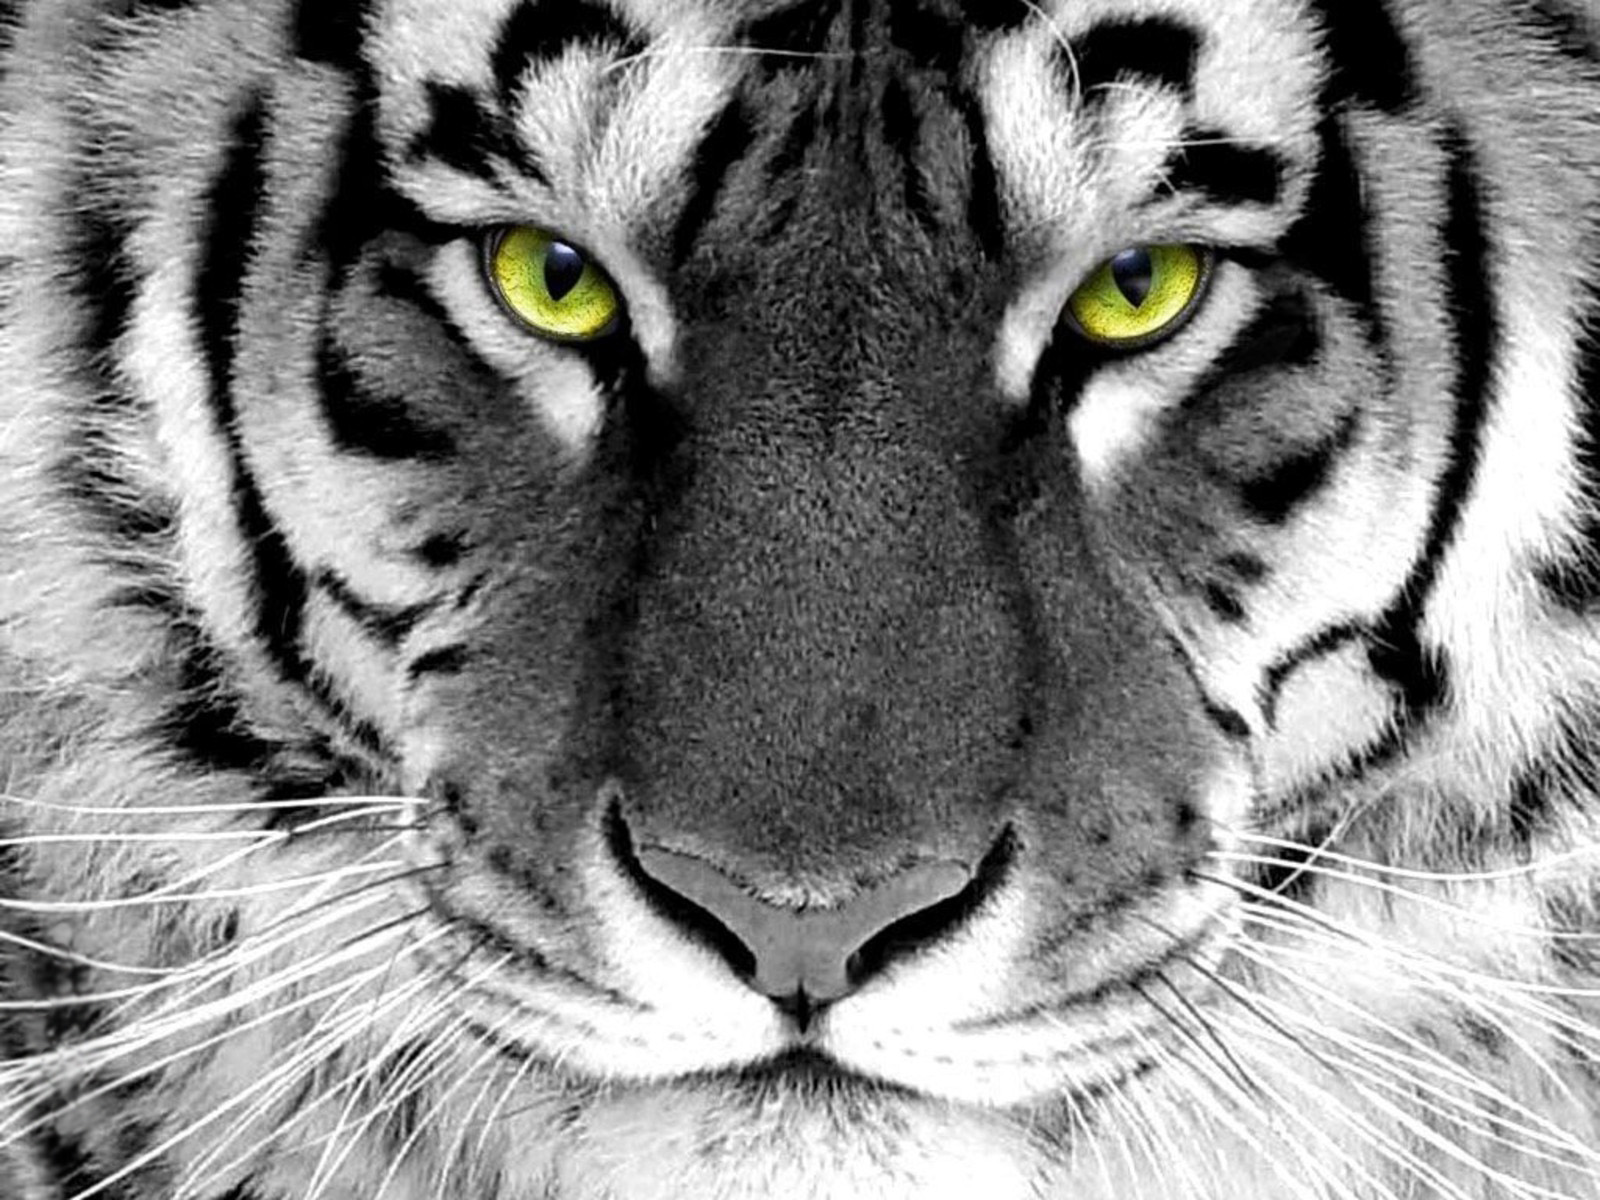 http://4.bp.blogspot.com/-5WzvsL7zjWM/UGQBPH0tj3I/AAAAAAAAHAk/OO0DuRgBoX0/s1600/Tiger-wallpaper-12.jpg